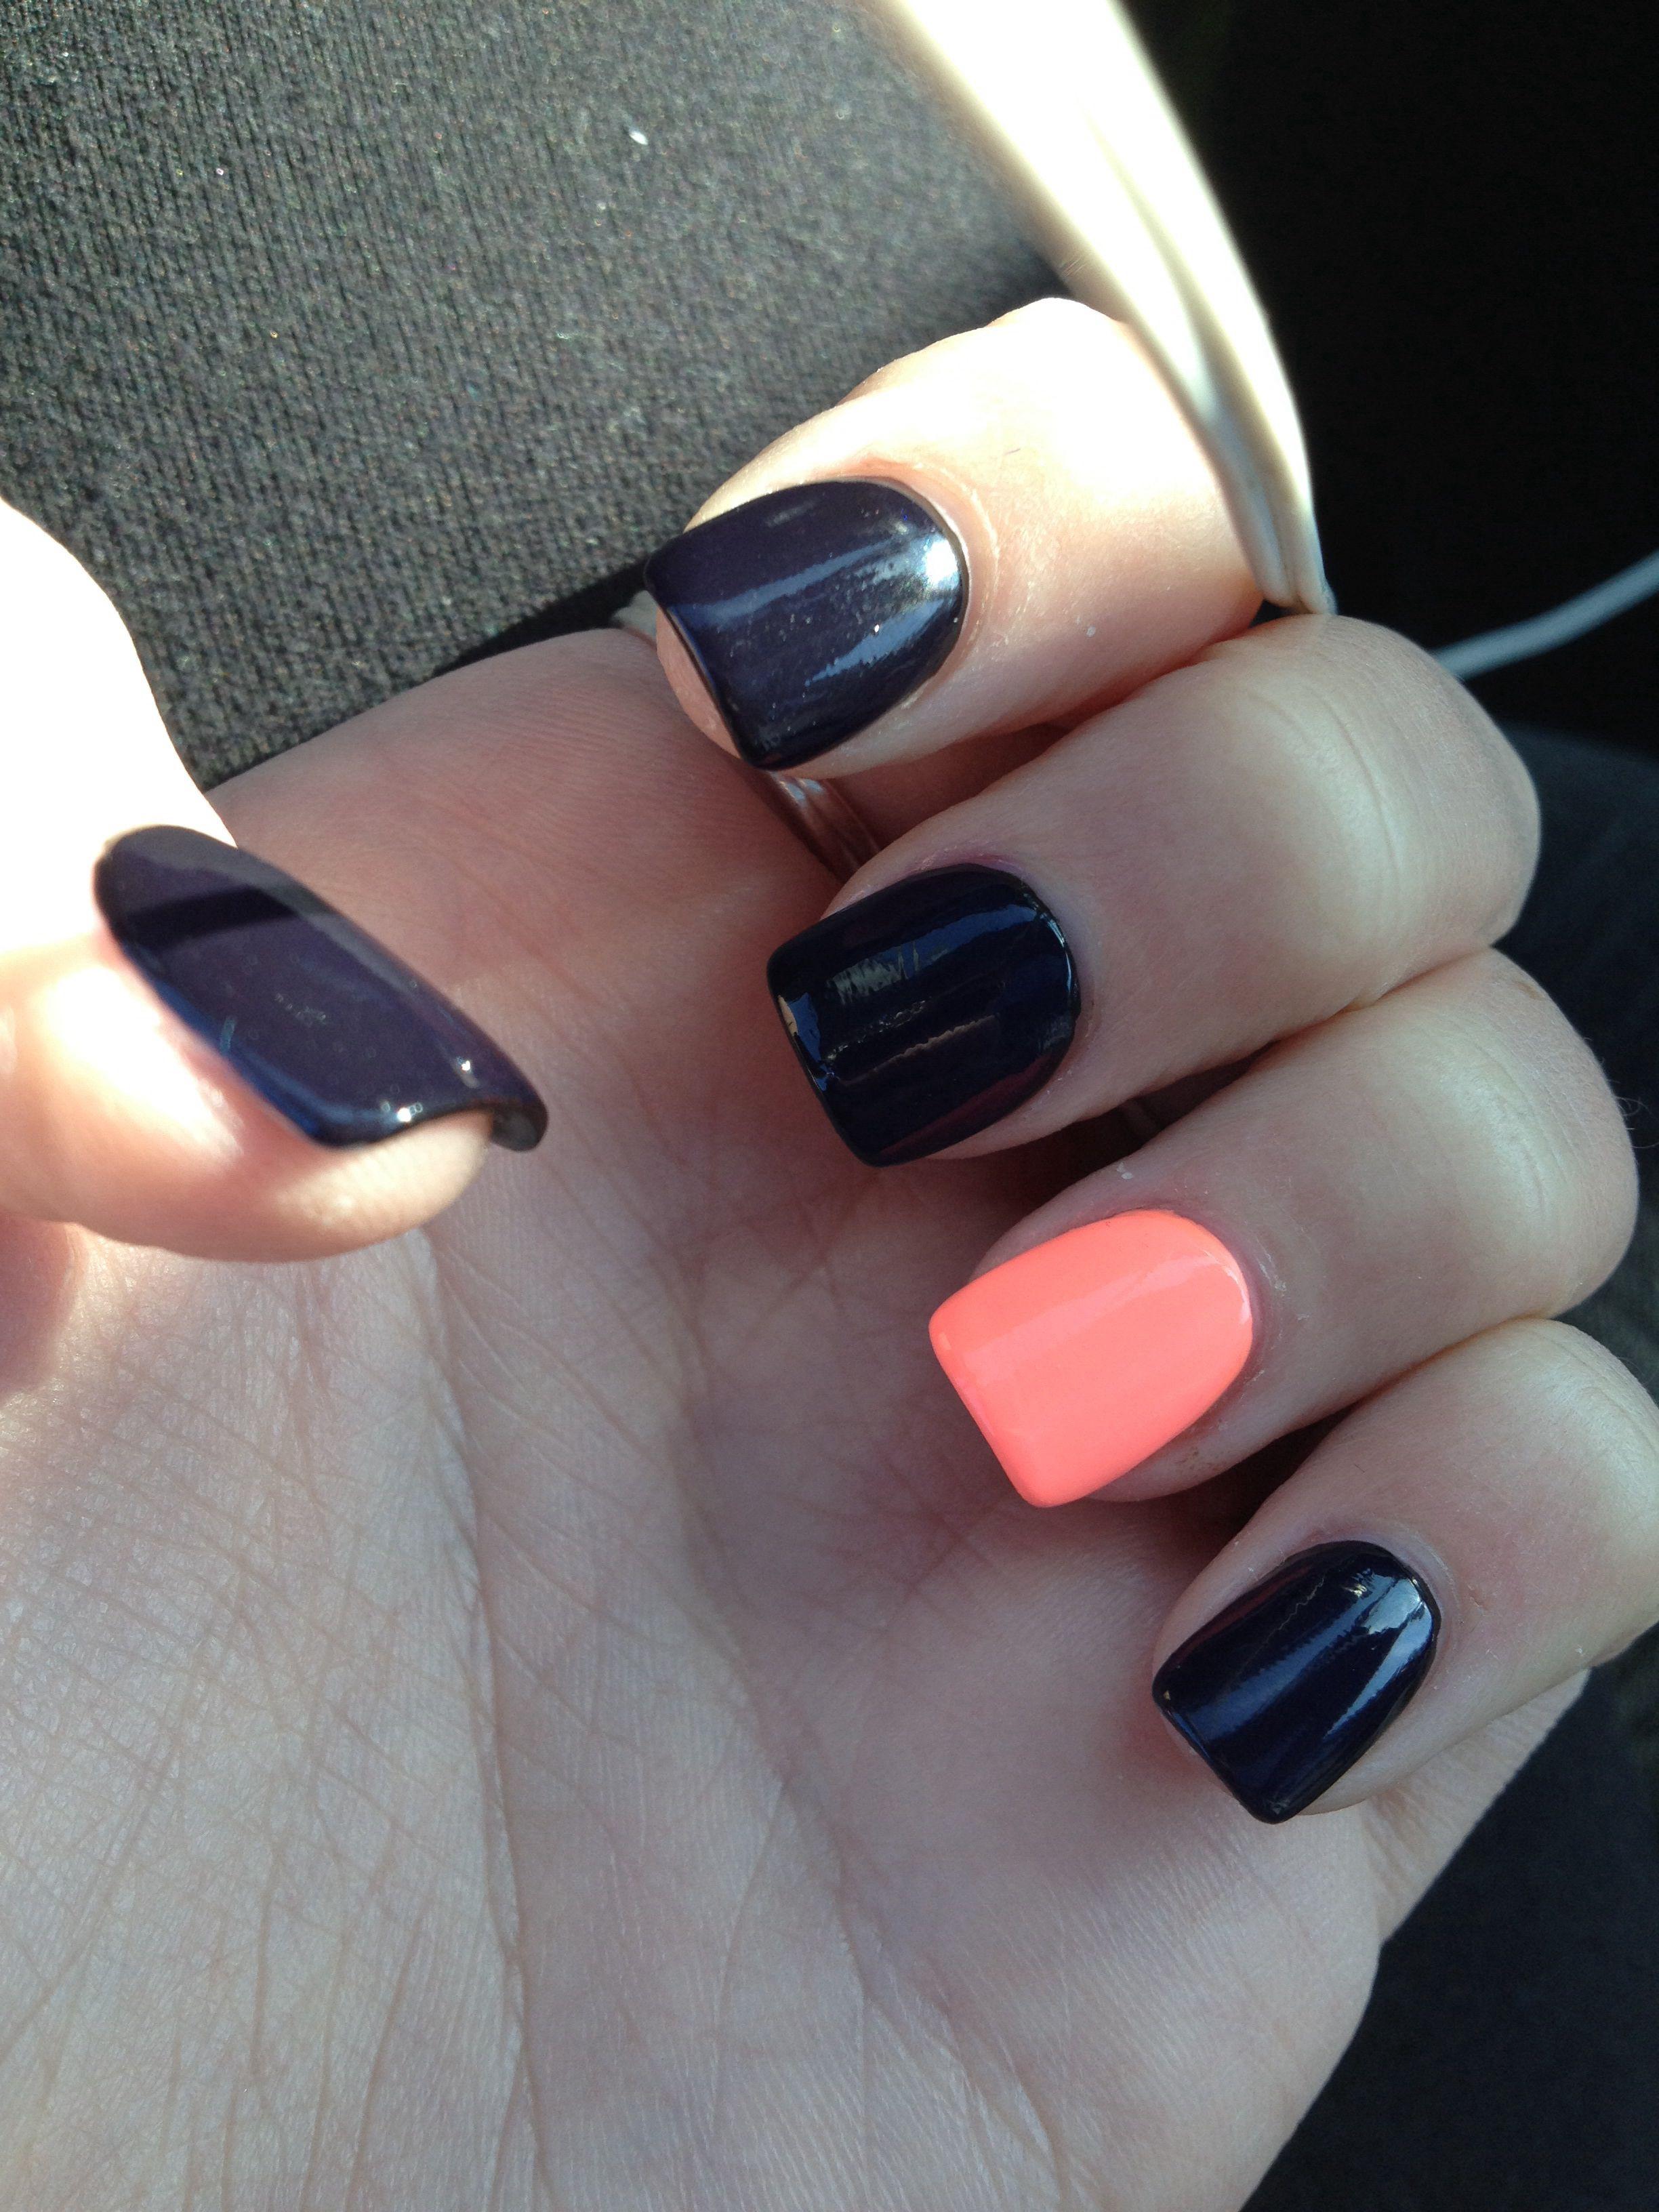 Fancy nails #nails #2014 #designs | NailTime | Pinterest | Nails ...